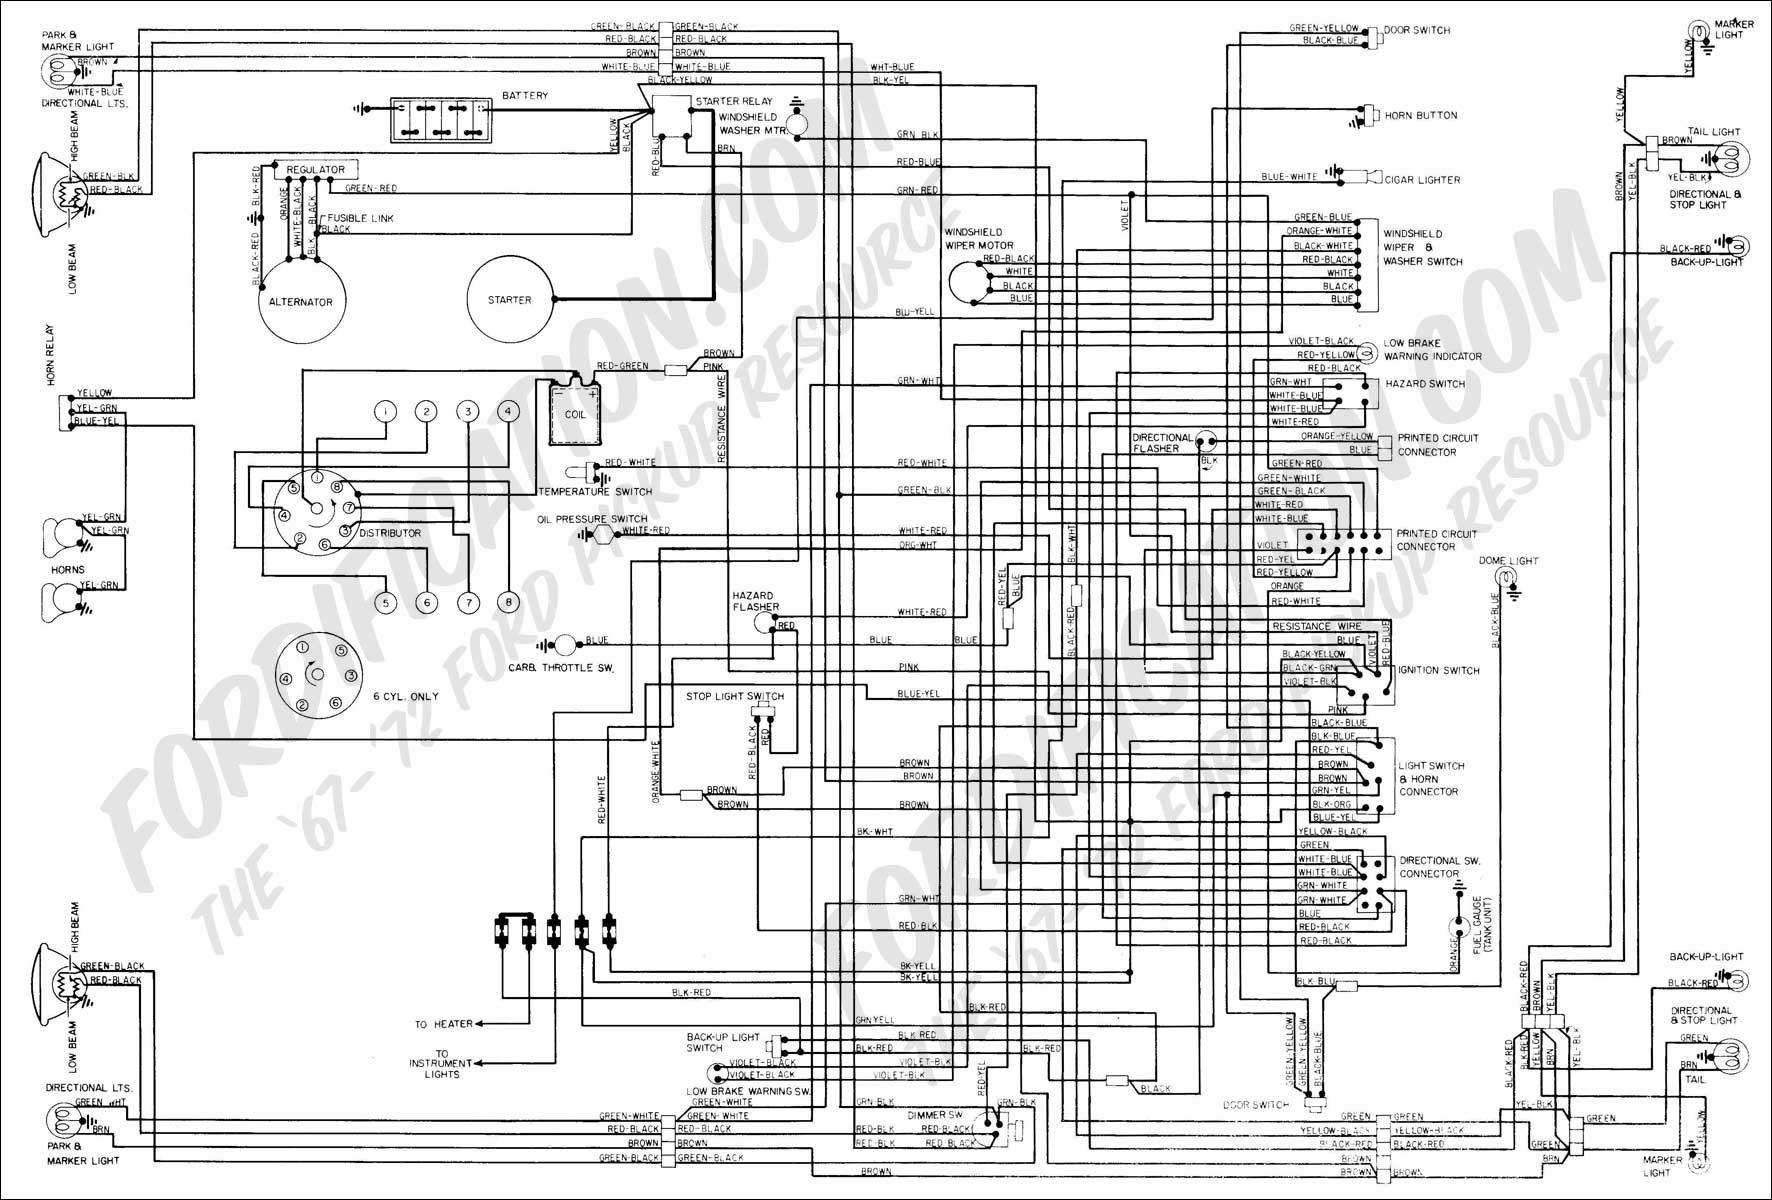 2004 ford explorer engine diagram ford f350 wiring diagram 5 lenito 2004 ford f250 wiring diagram at 2004 Ford F350 Wiring Diagram